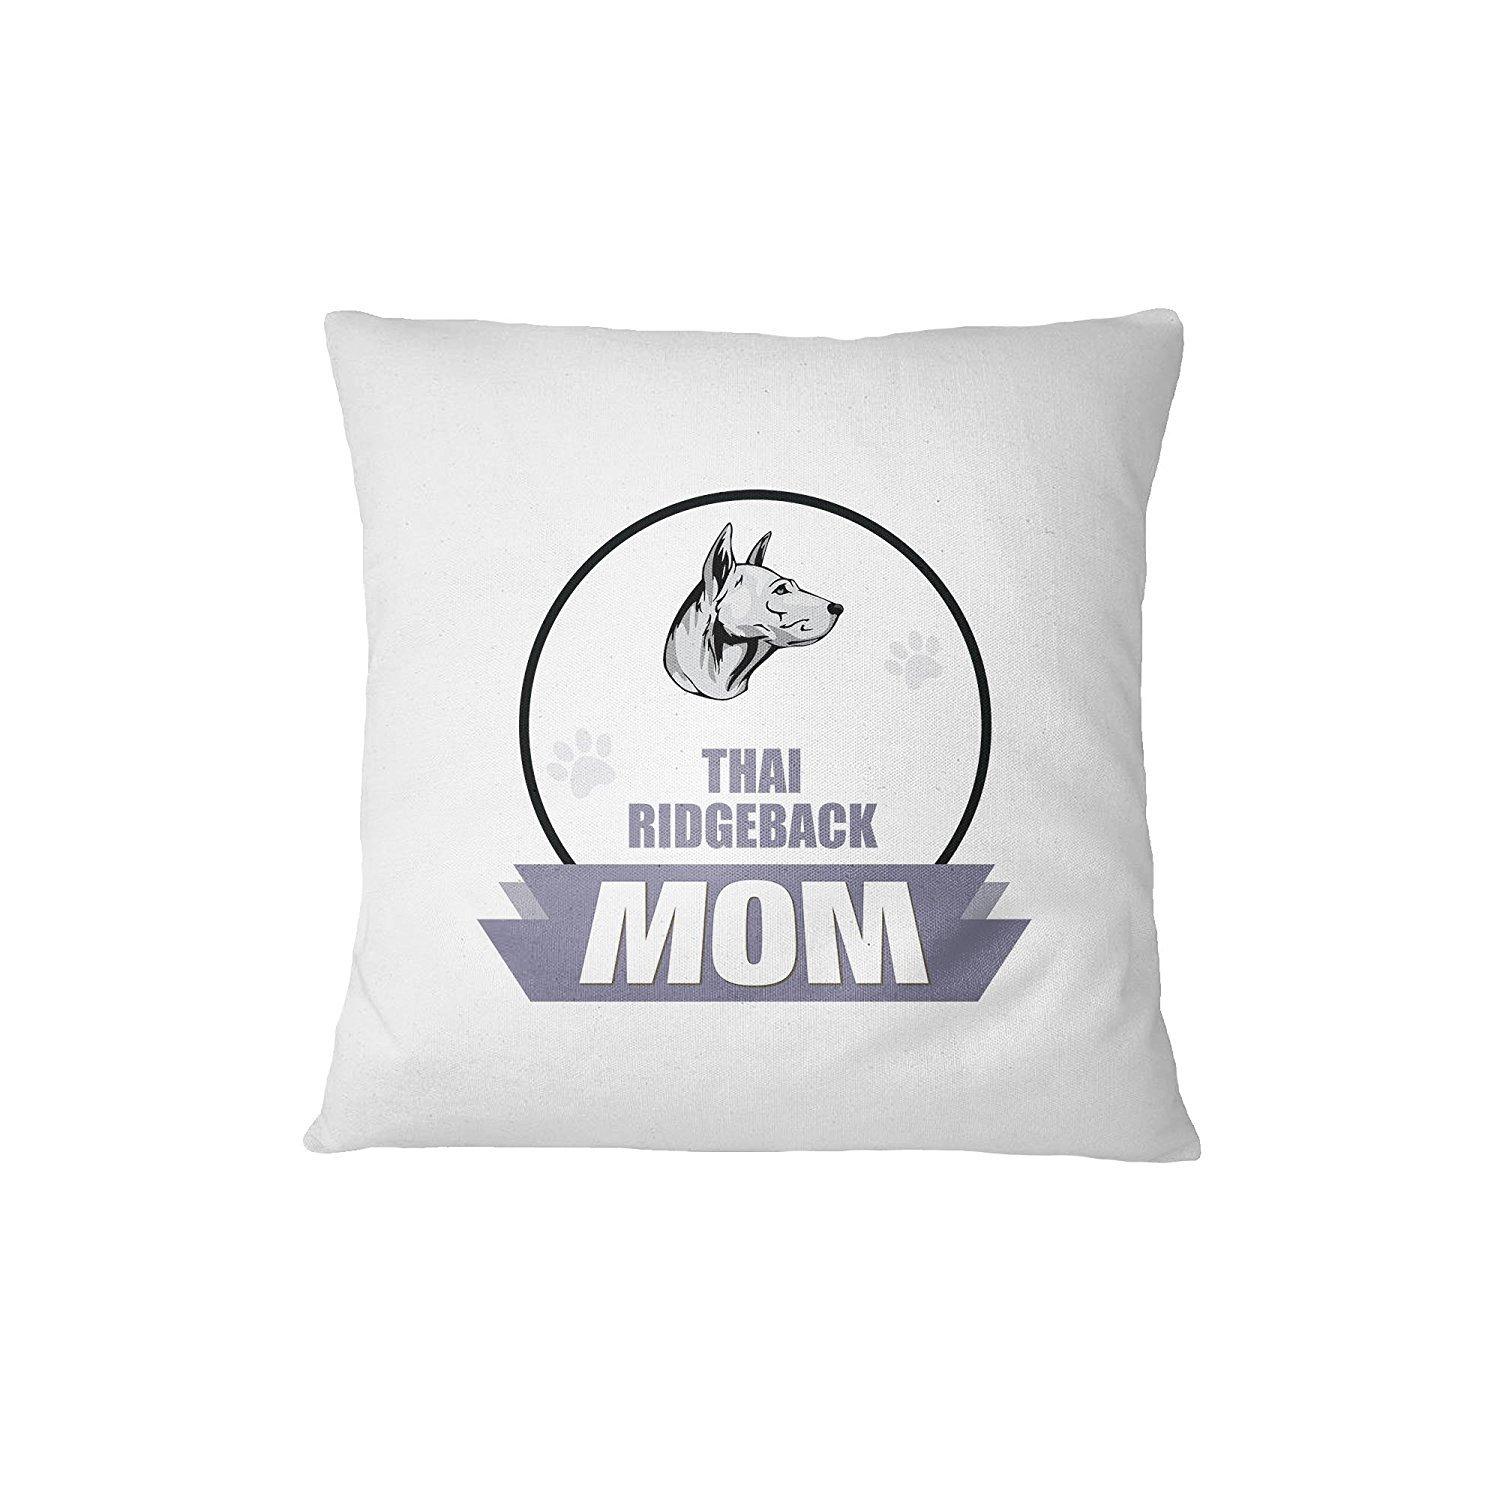 THAI RIDGEBACK DOG MOM Sofa Bed Home Decor Pillow Cover Cover Only RENJUNDUN by RENJUNDUN